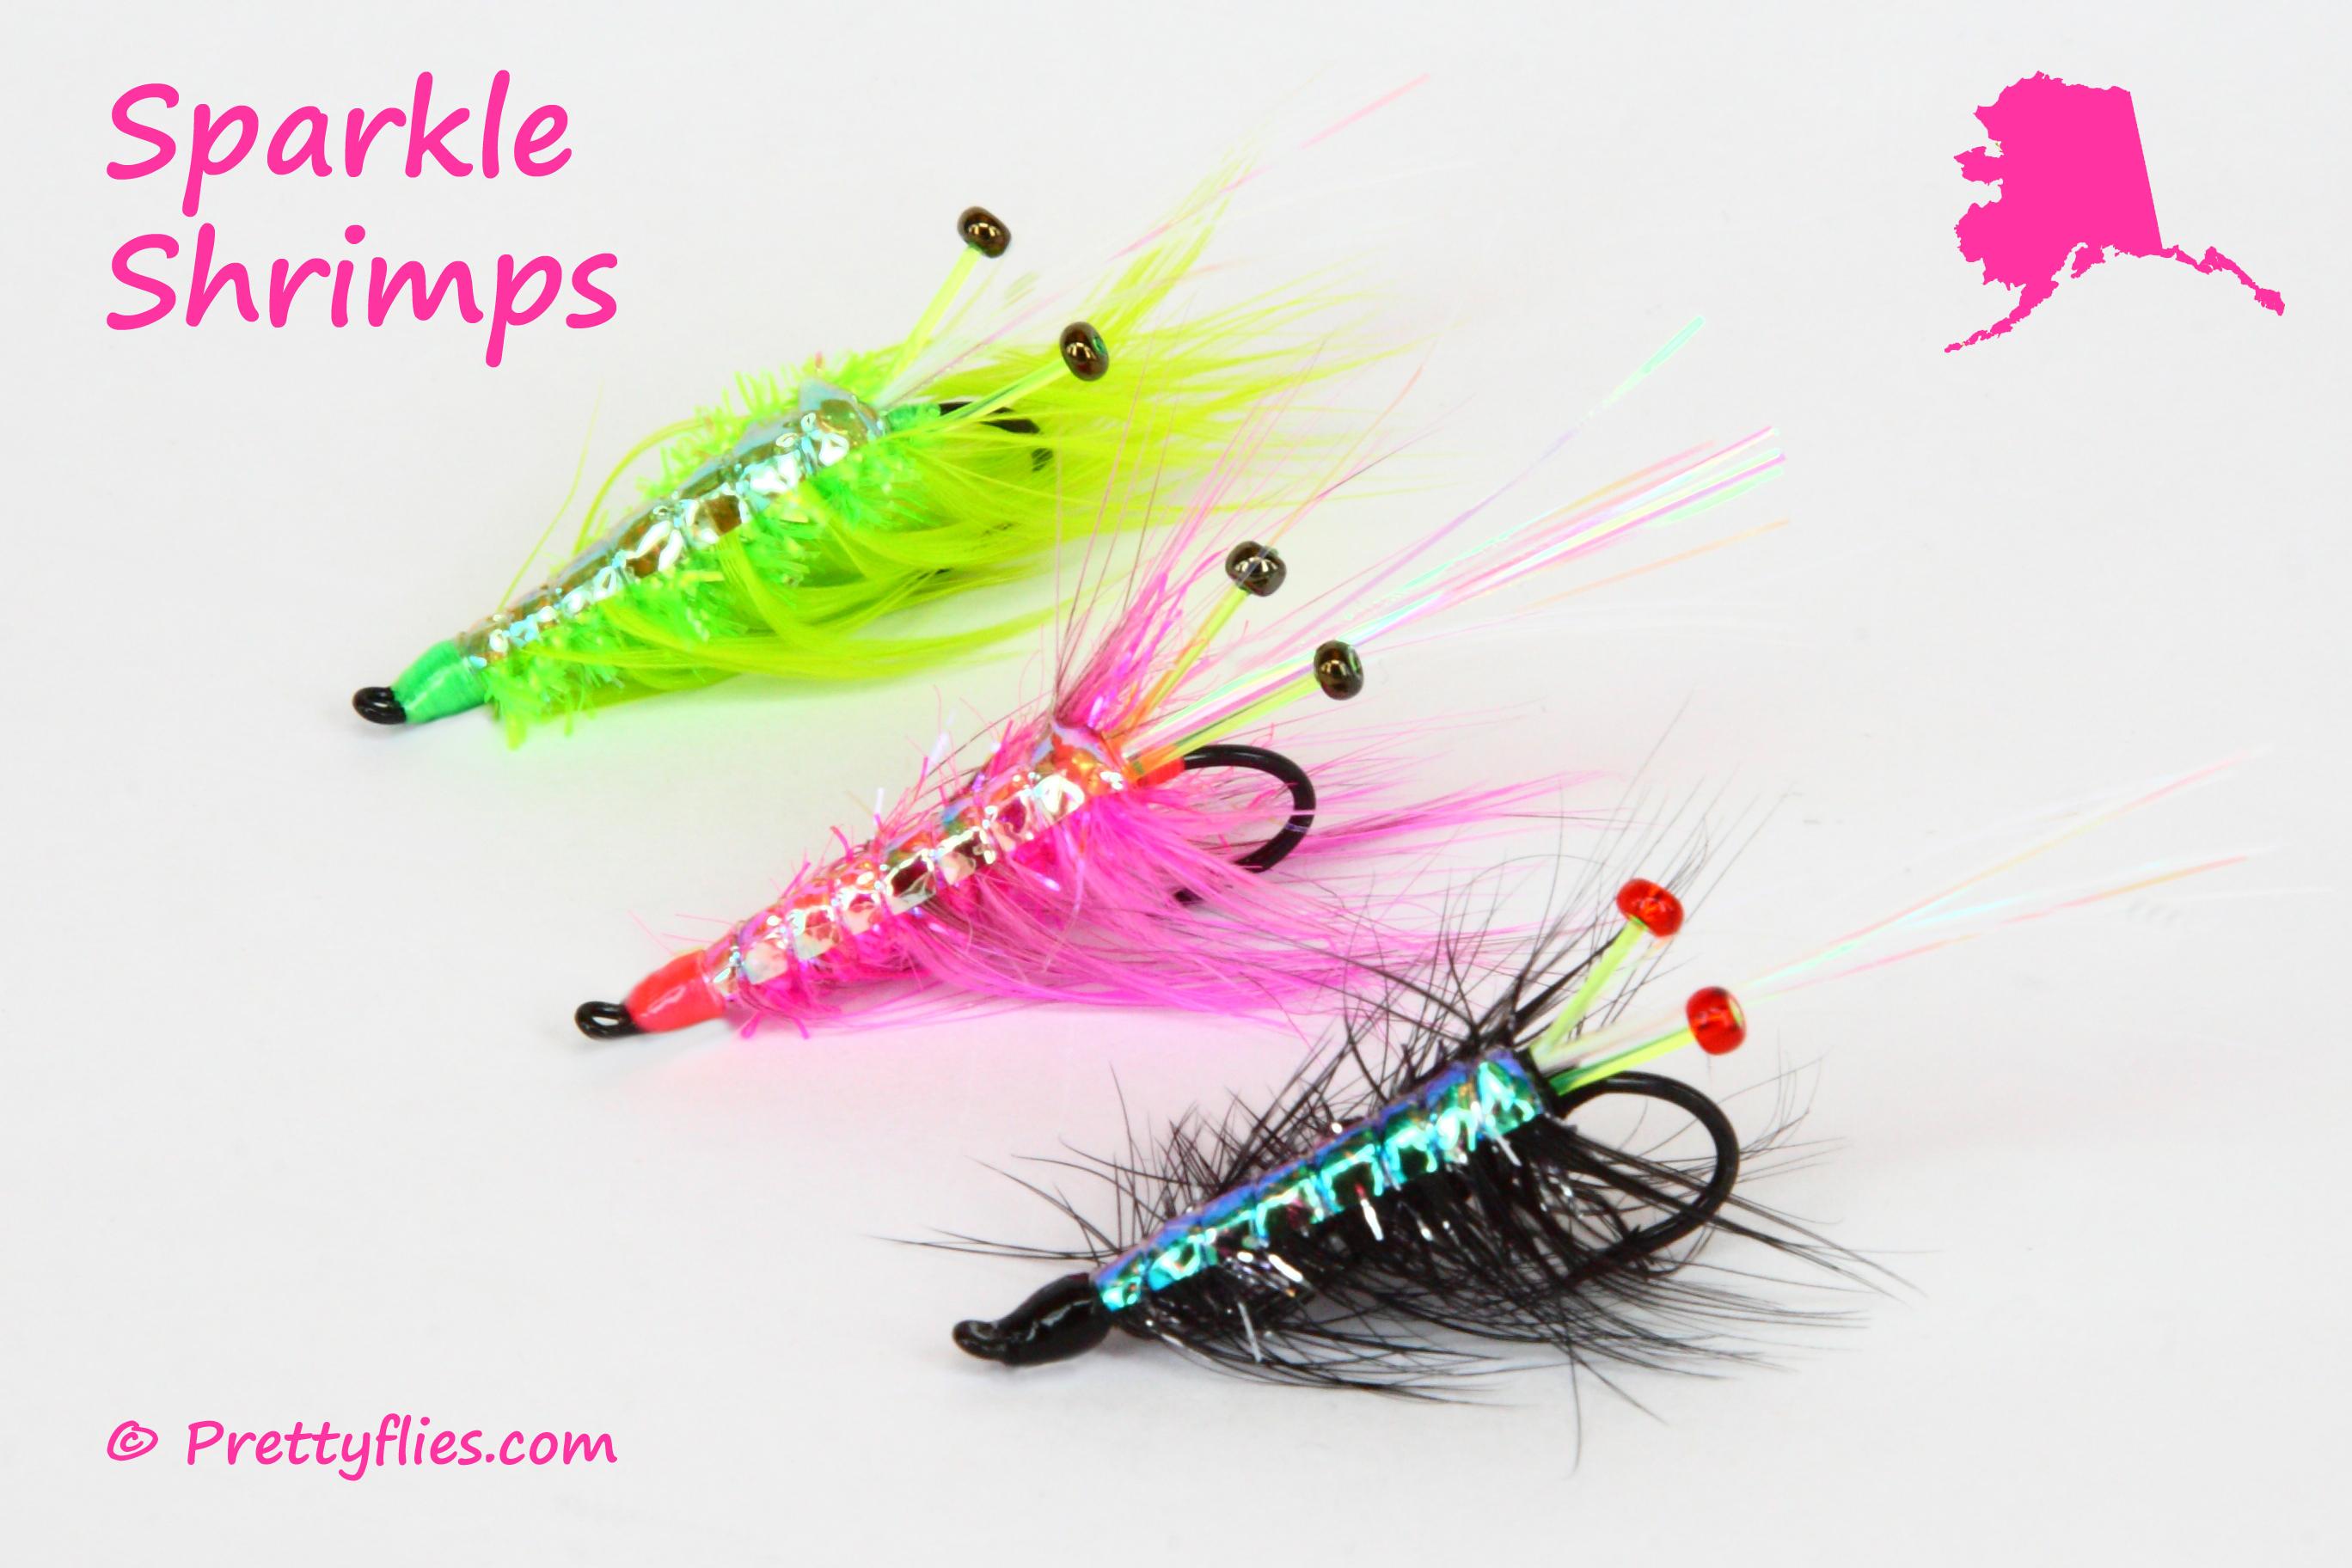 Sparkle Shrimps.jpg